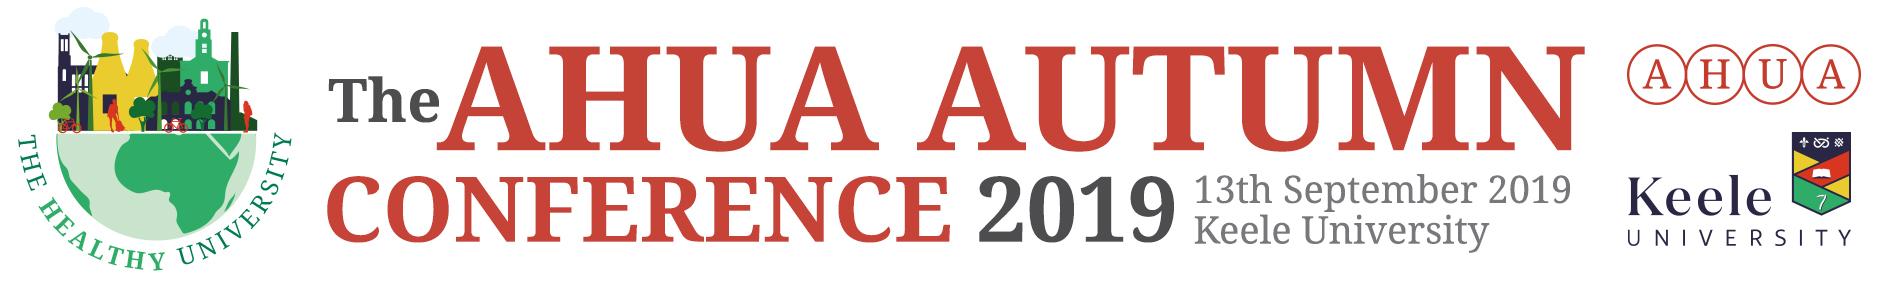 AHUA Autumn Conference 2019